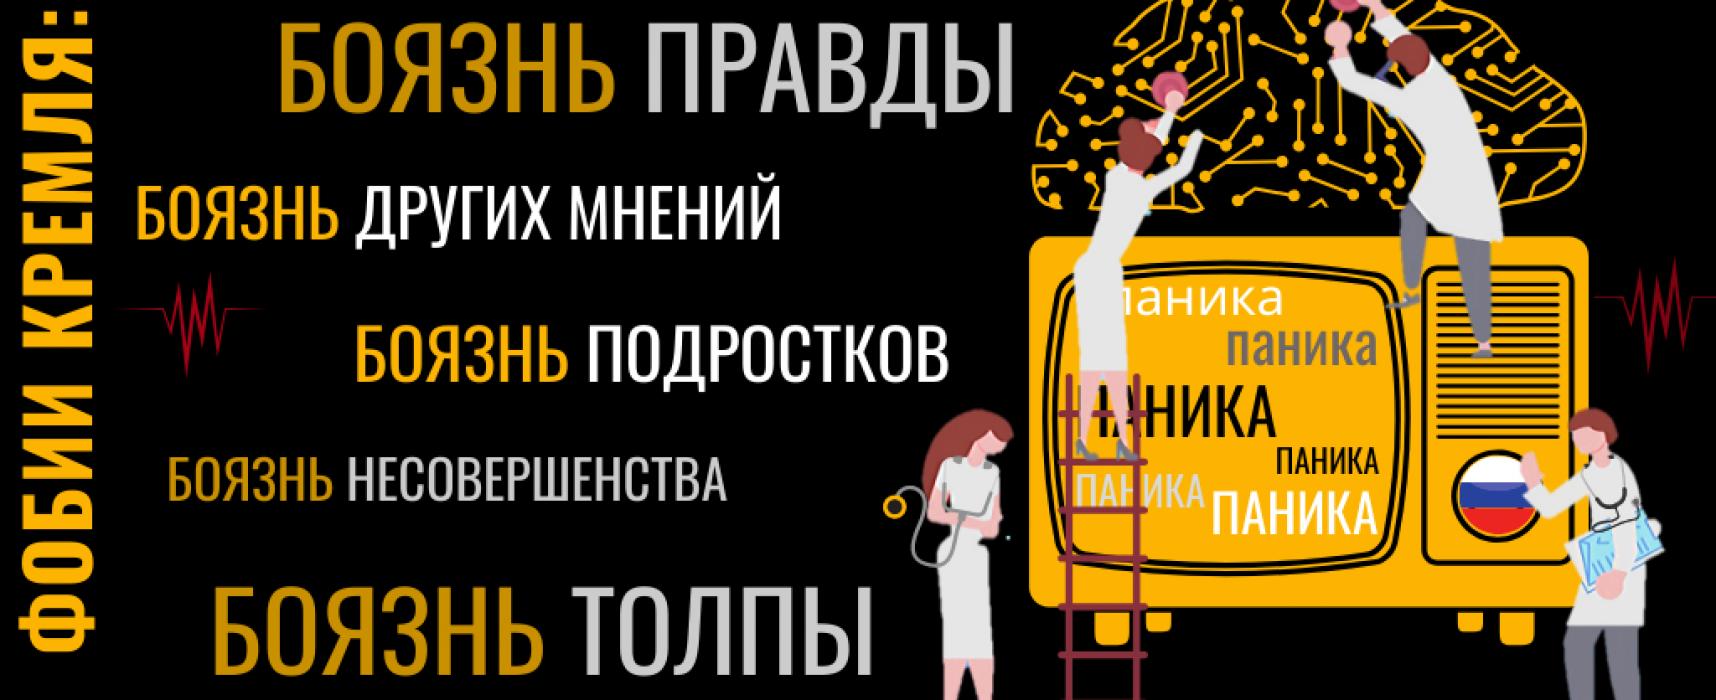 Panika a strach: katalog kremelských fobií